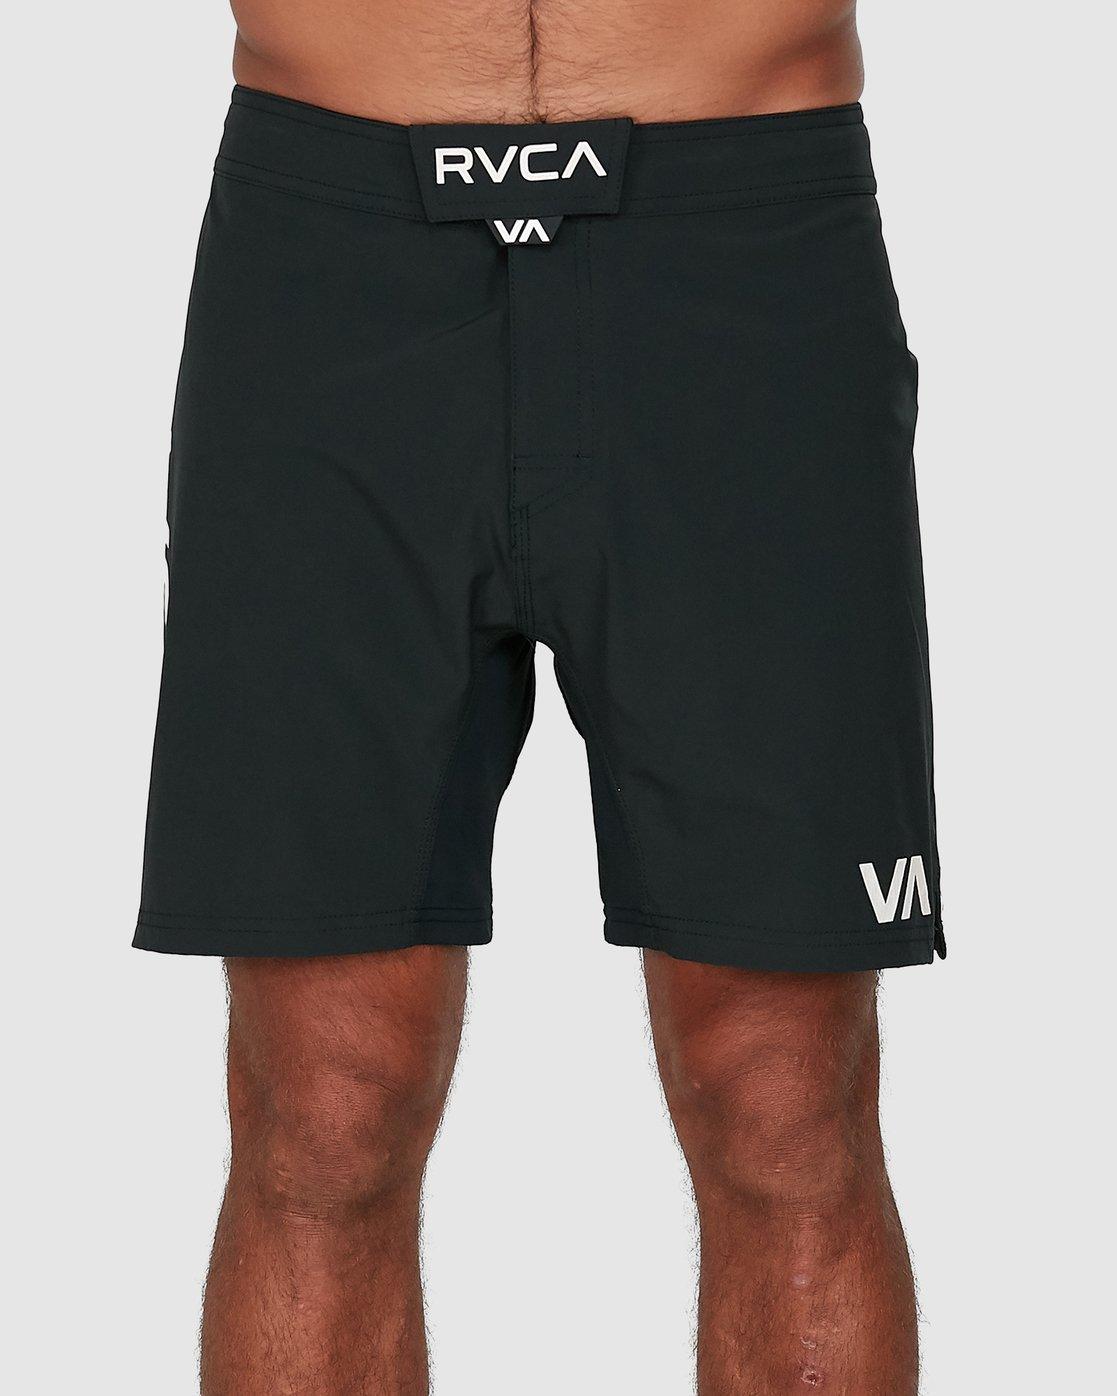 1 FIGHT SCRAPPER SHORTS Black R307311 RVCA